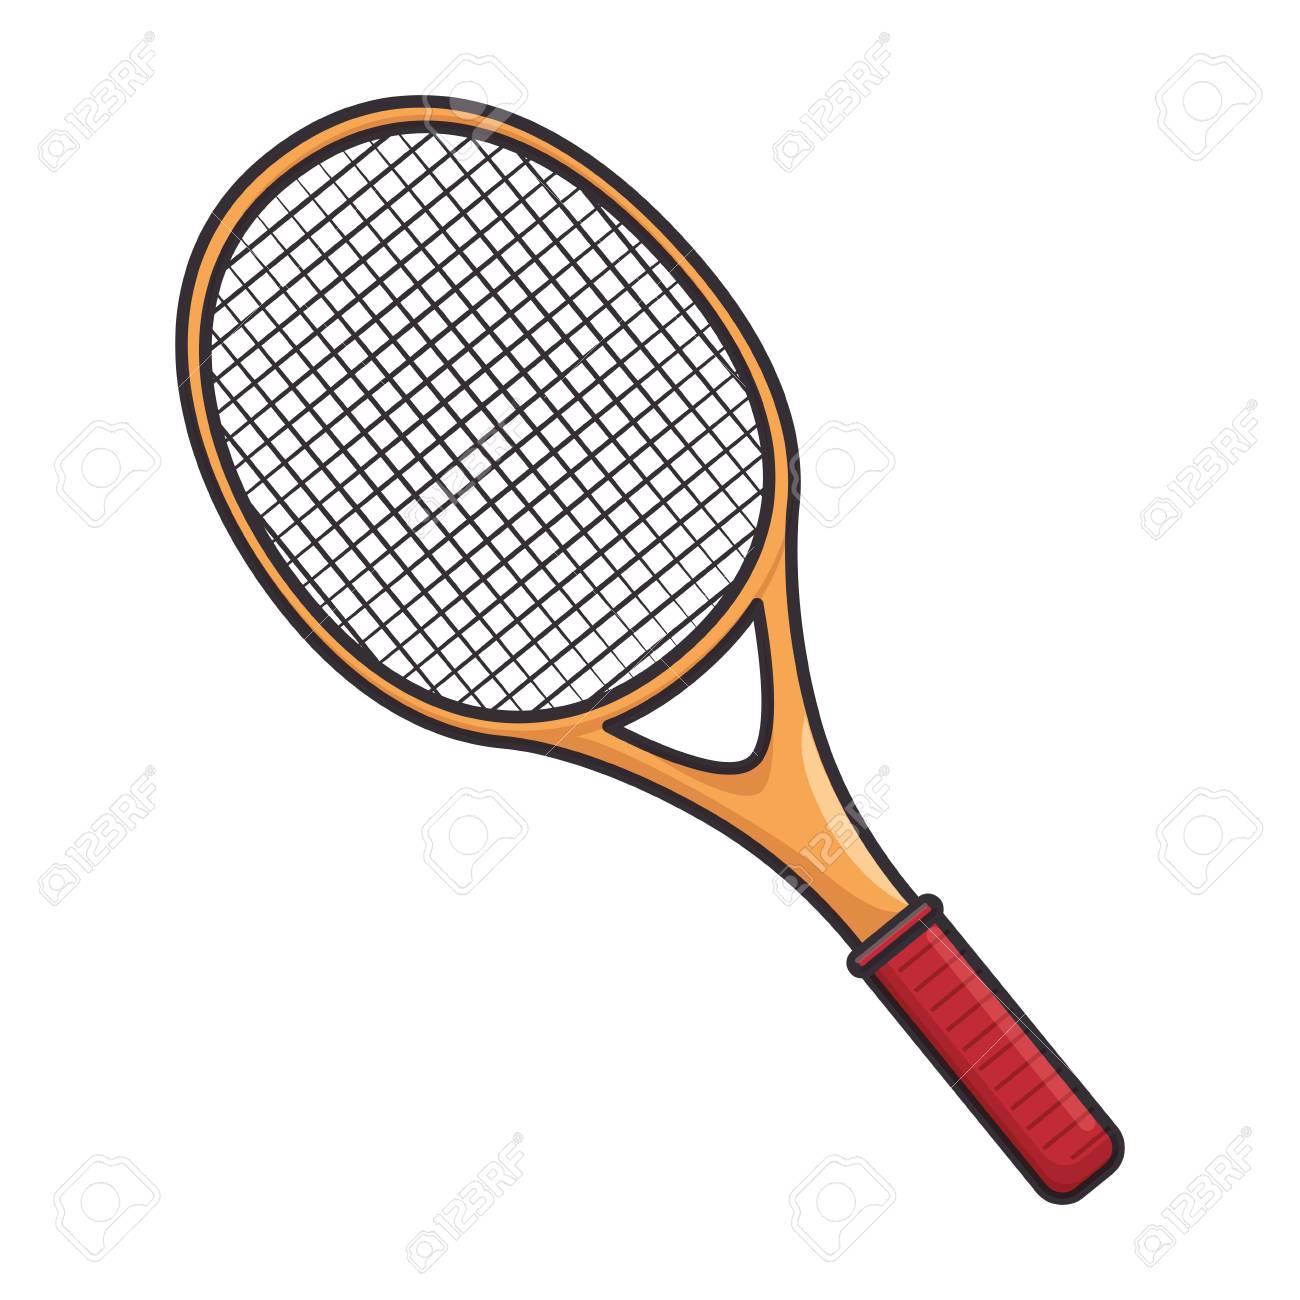 Tennis Racket Equipment Icon Vector Illustration Graphic Design